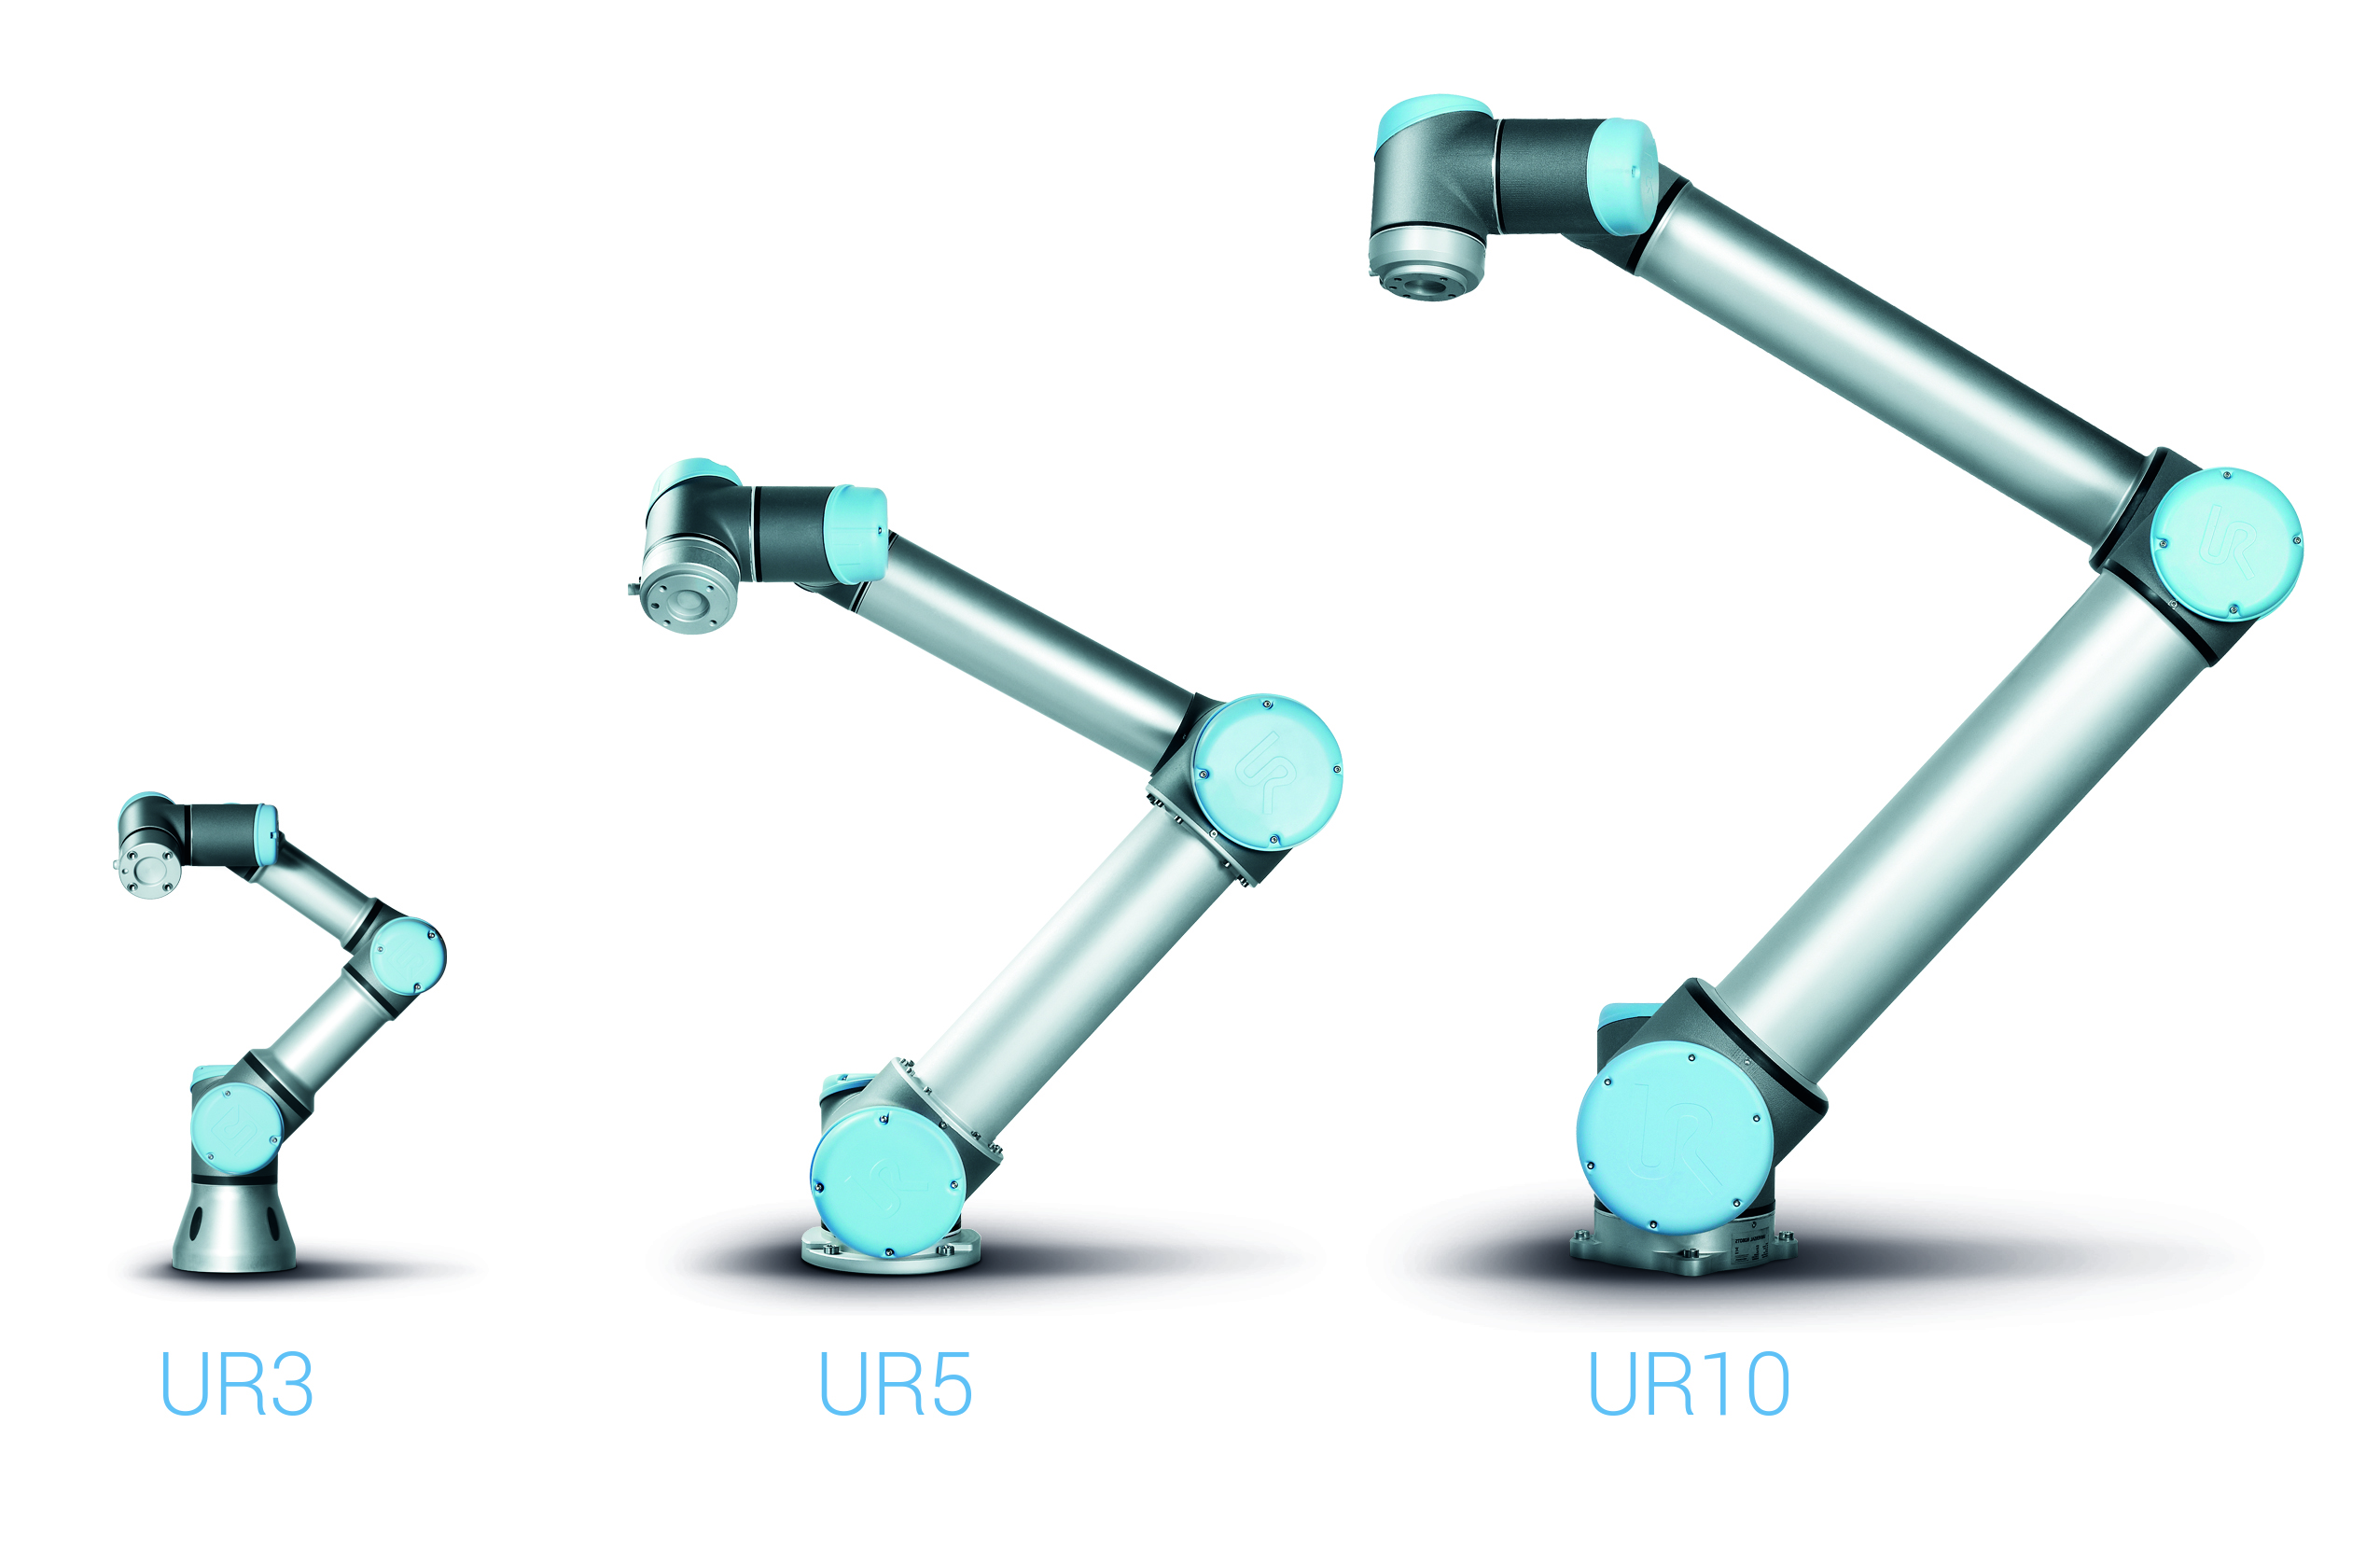 universal robots, ur3, ur5, ur10,